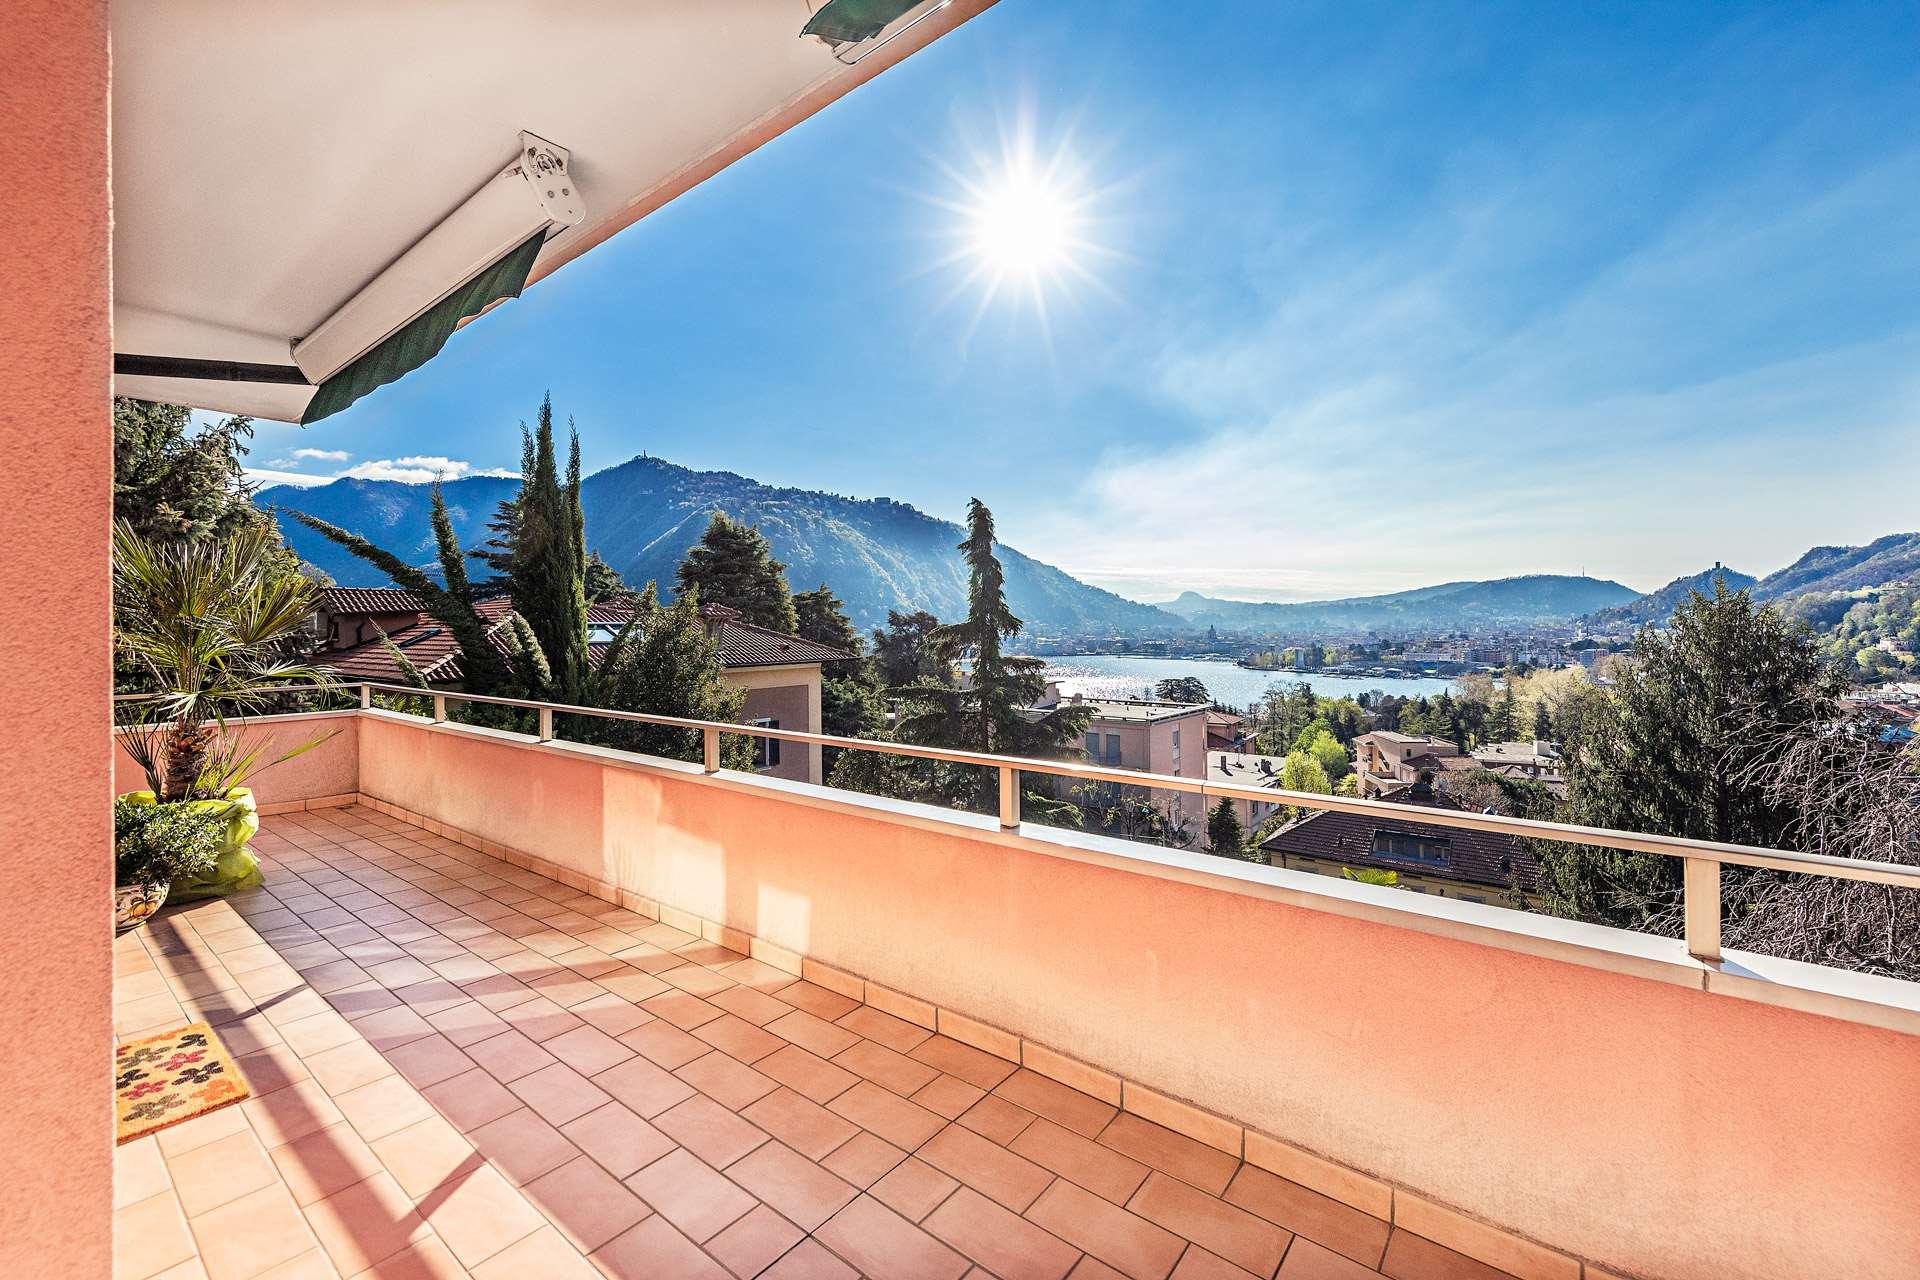 Villa signorile in zona panoramica vista lago ! Gallery